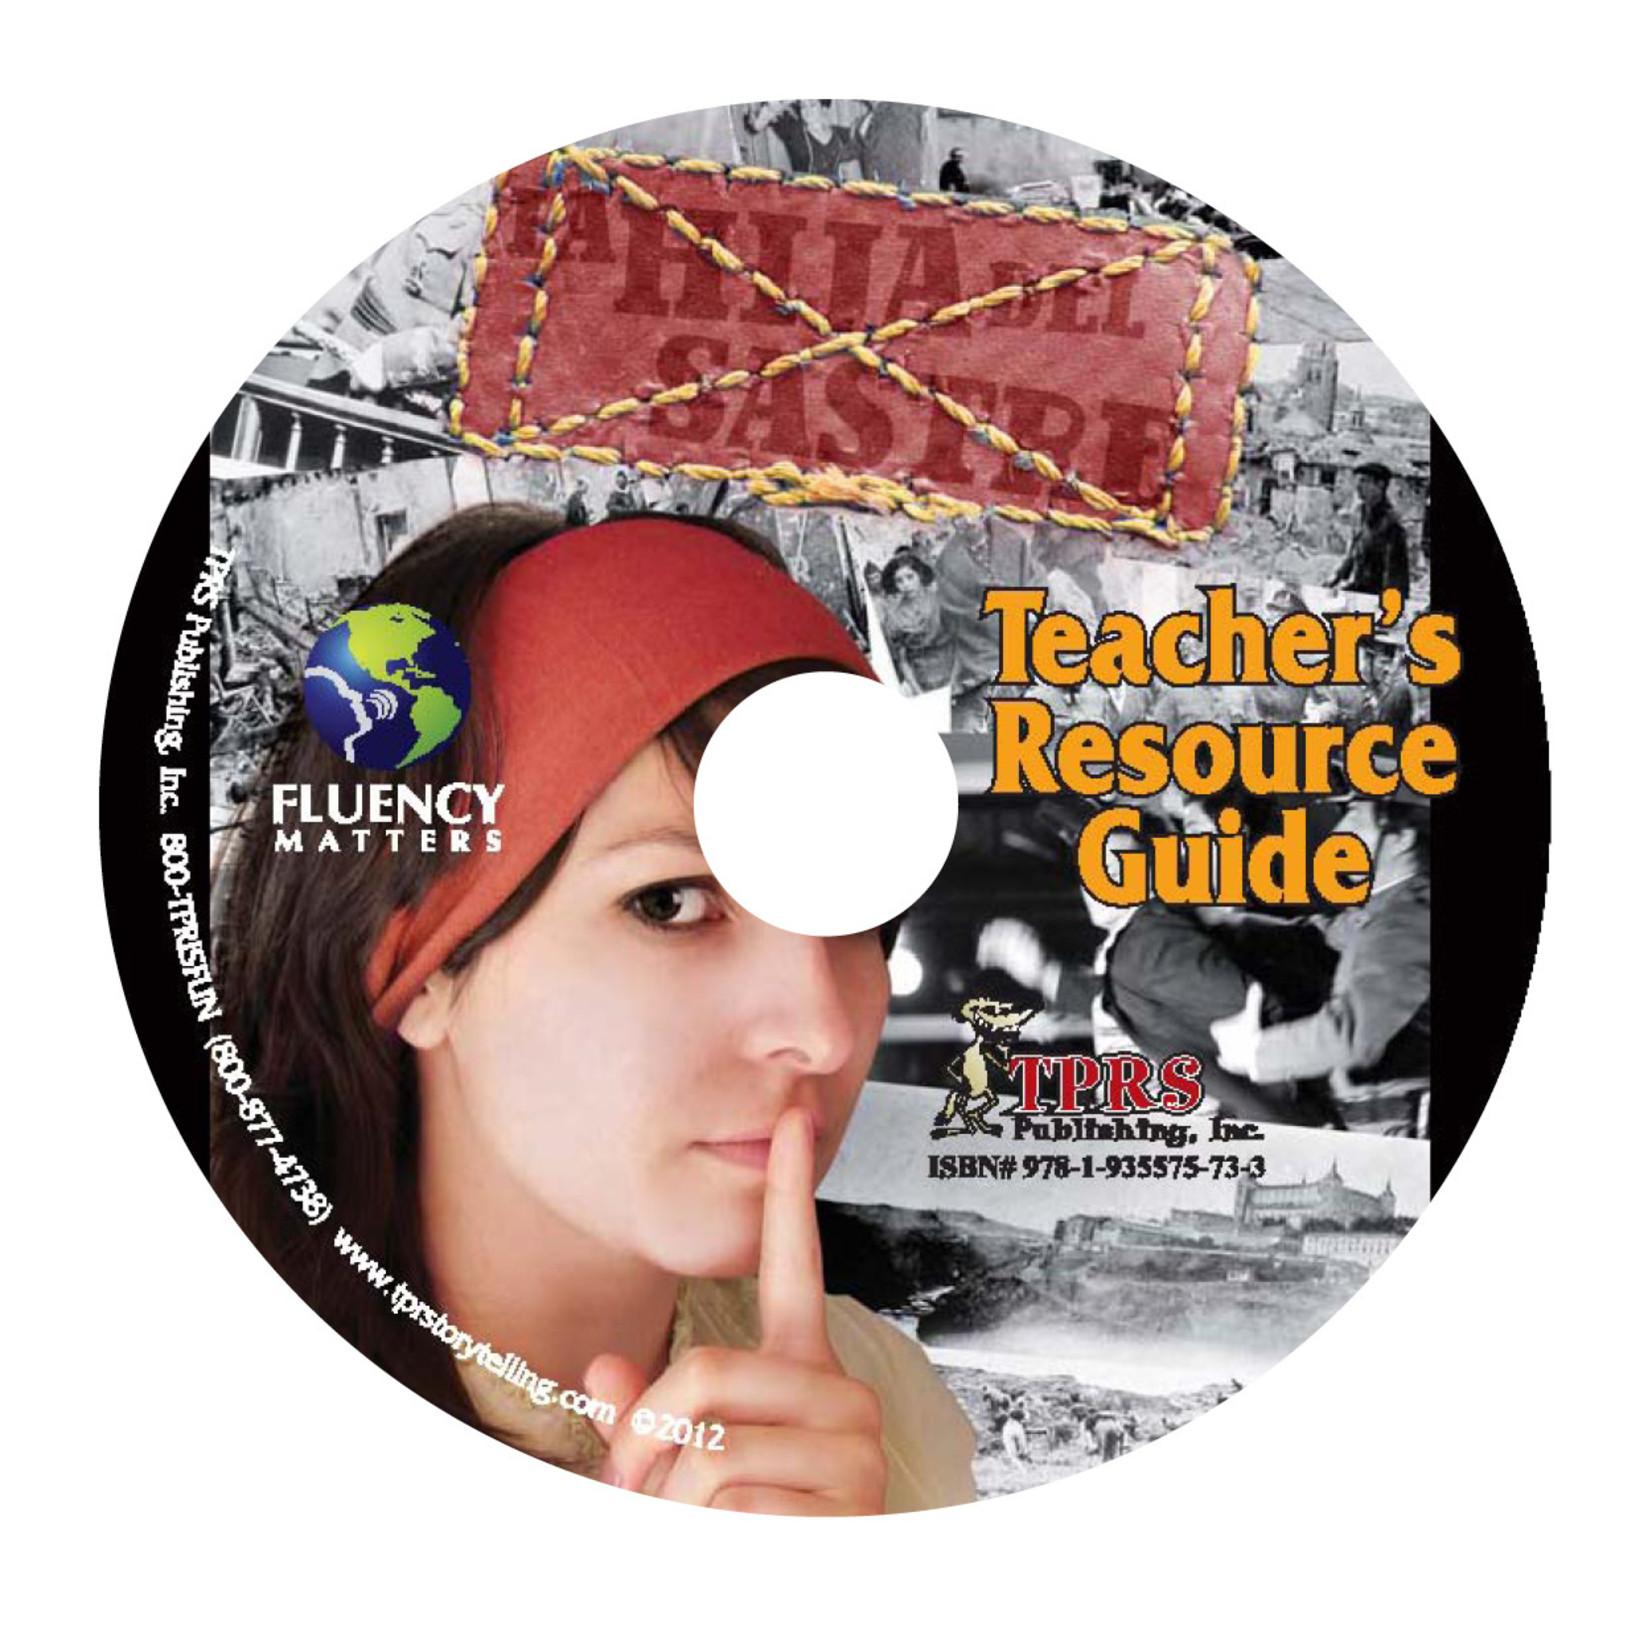 Fluency Matters La hija del sastre - Teacher's Guide on CD